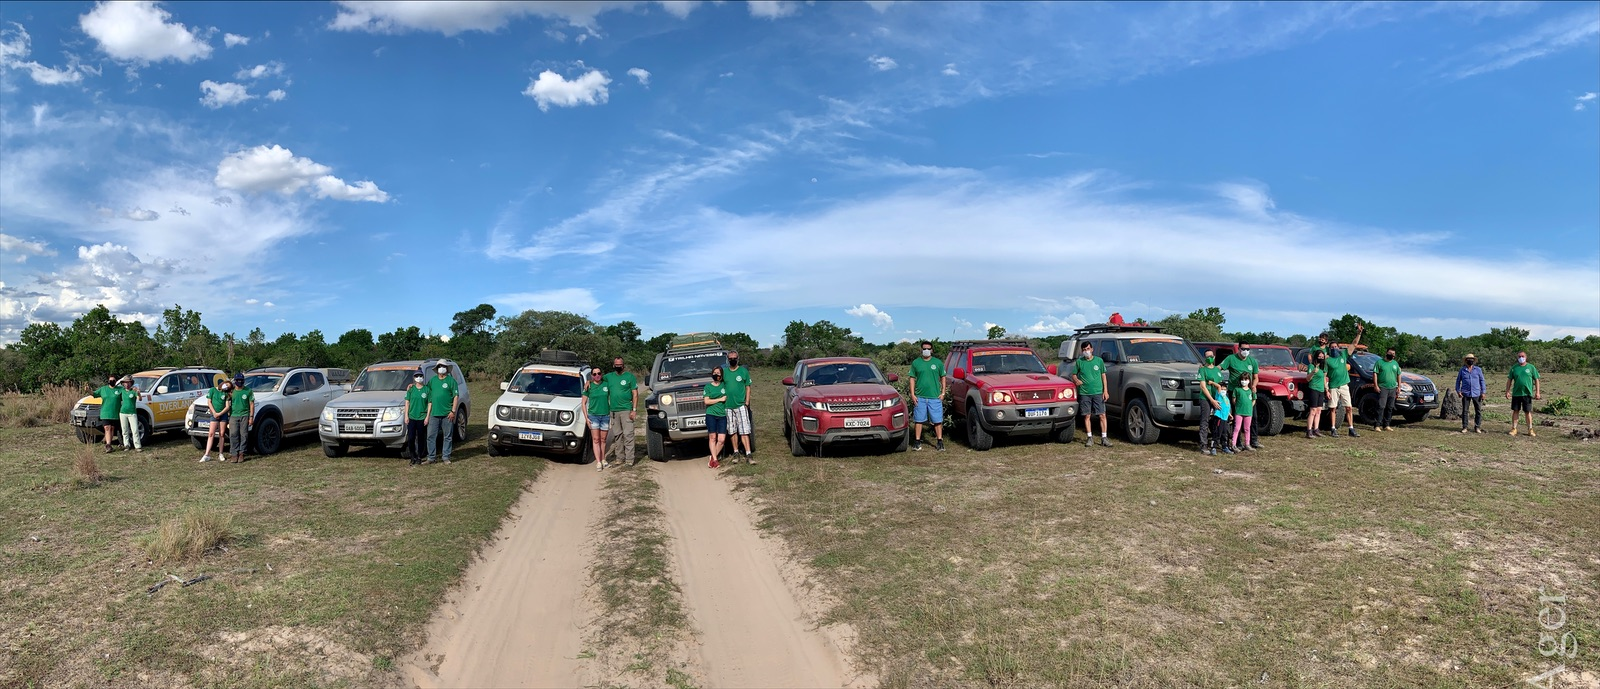 255_Overlander_Gaia_Pantanal